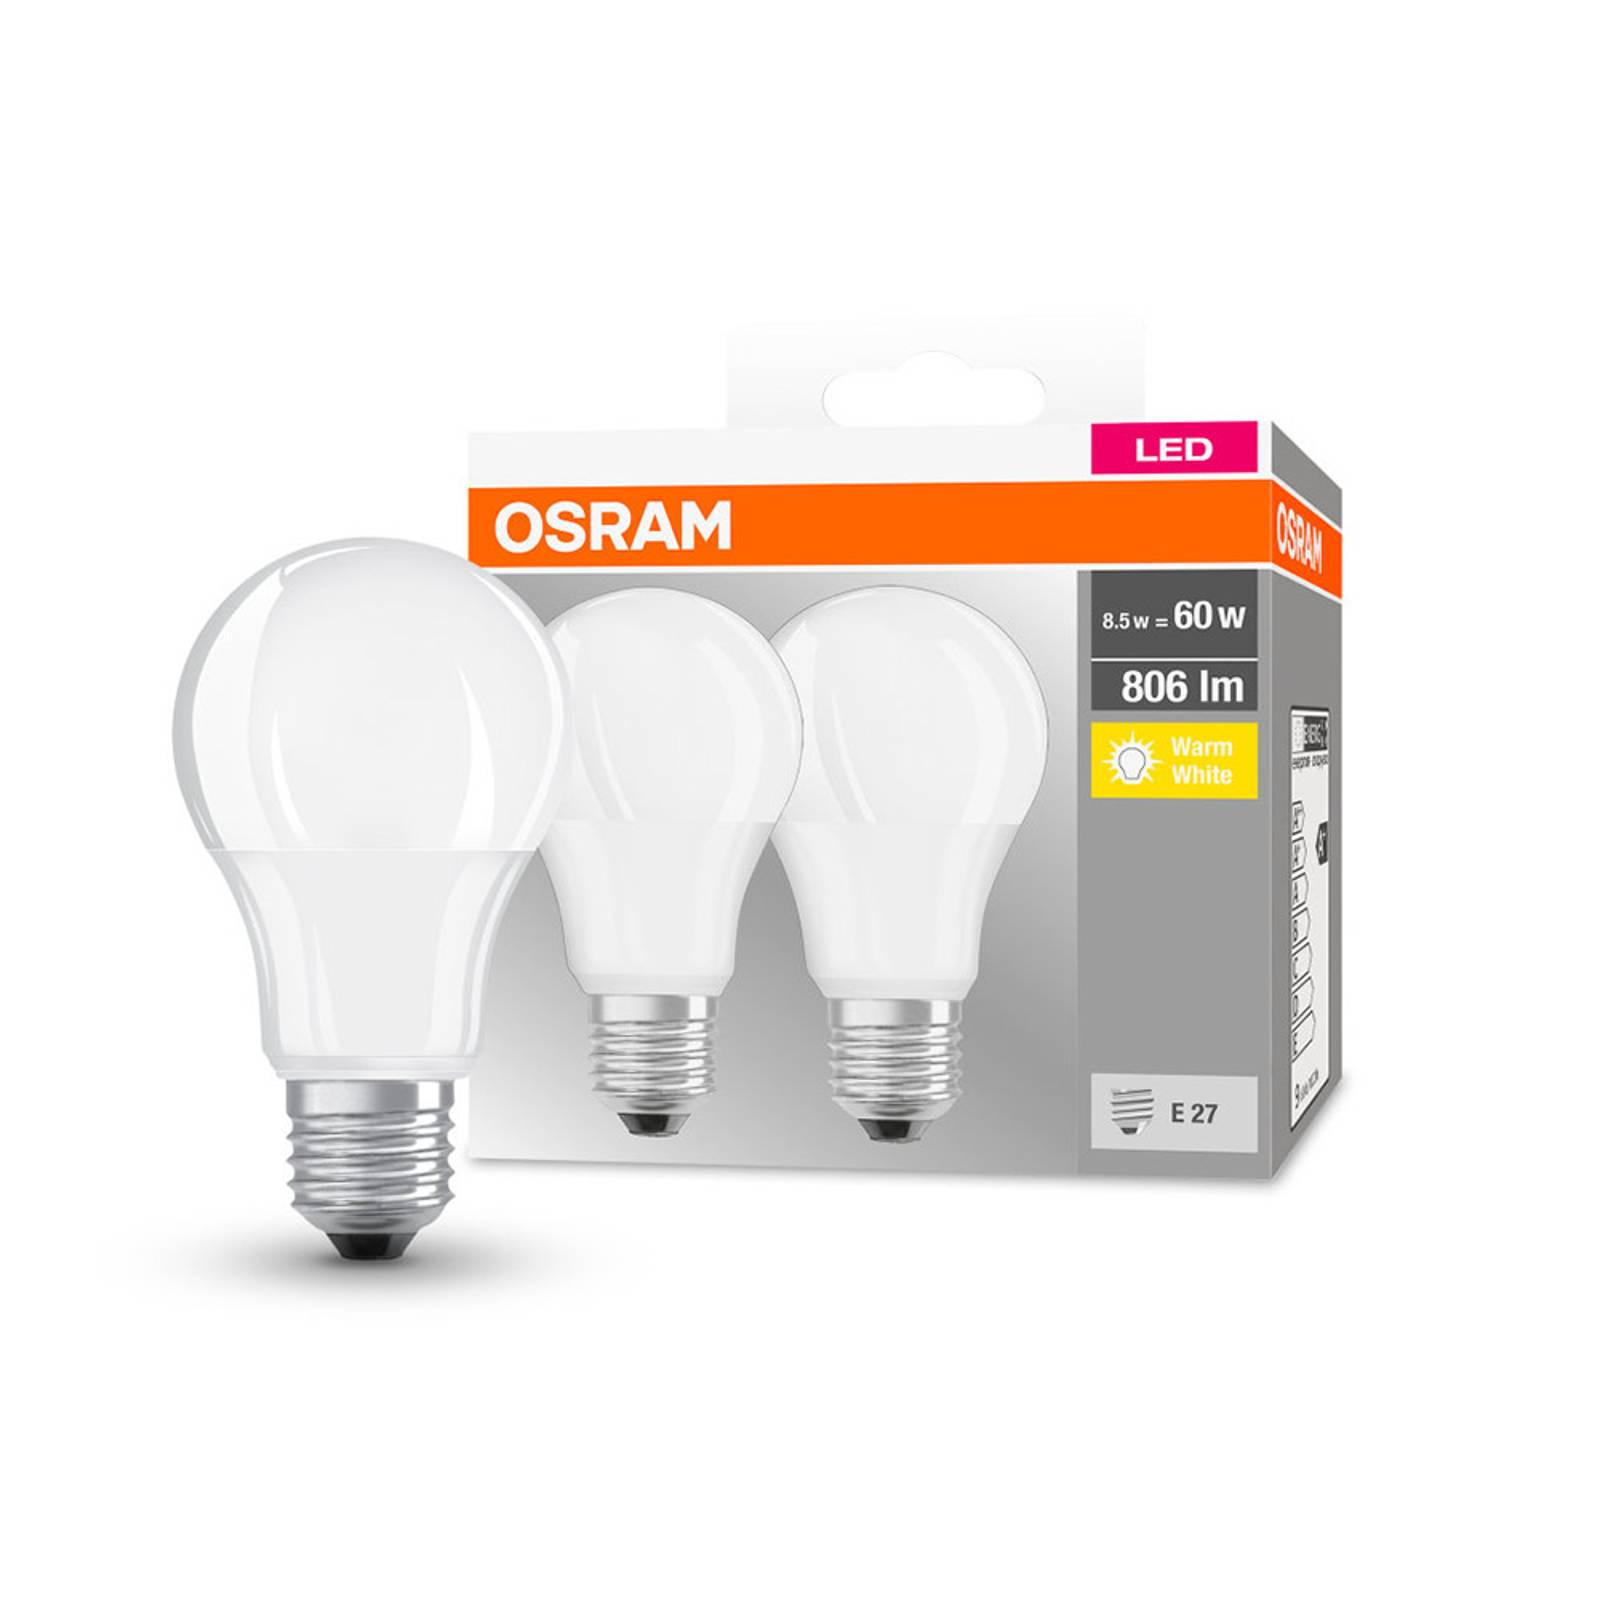 OSRAM-LED-lamppu Classic E27 8,5W 2700K 806lm 2kpl